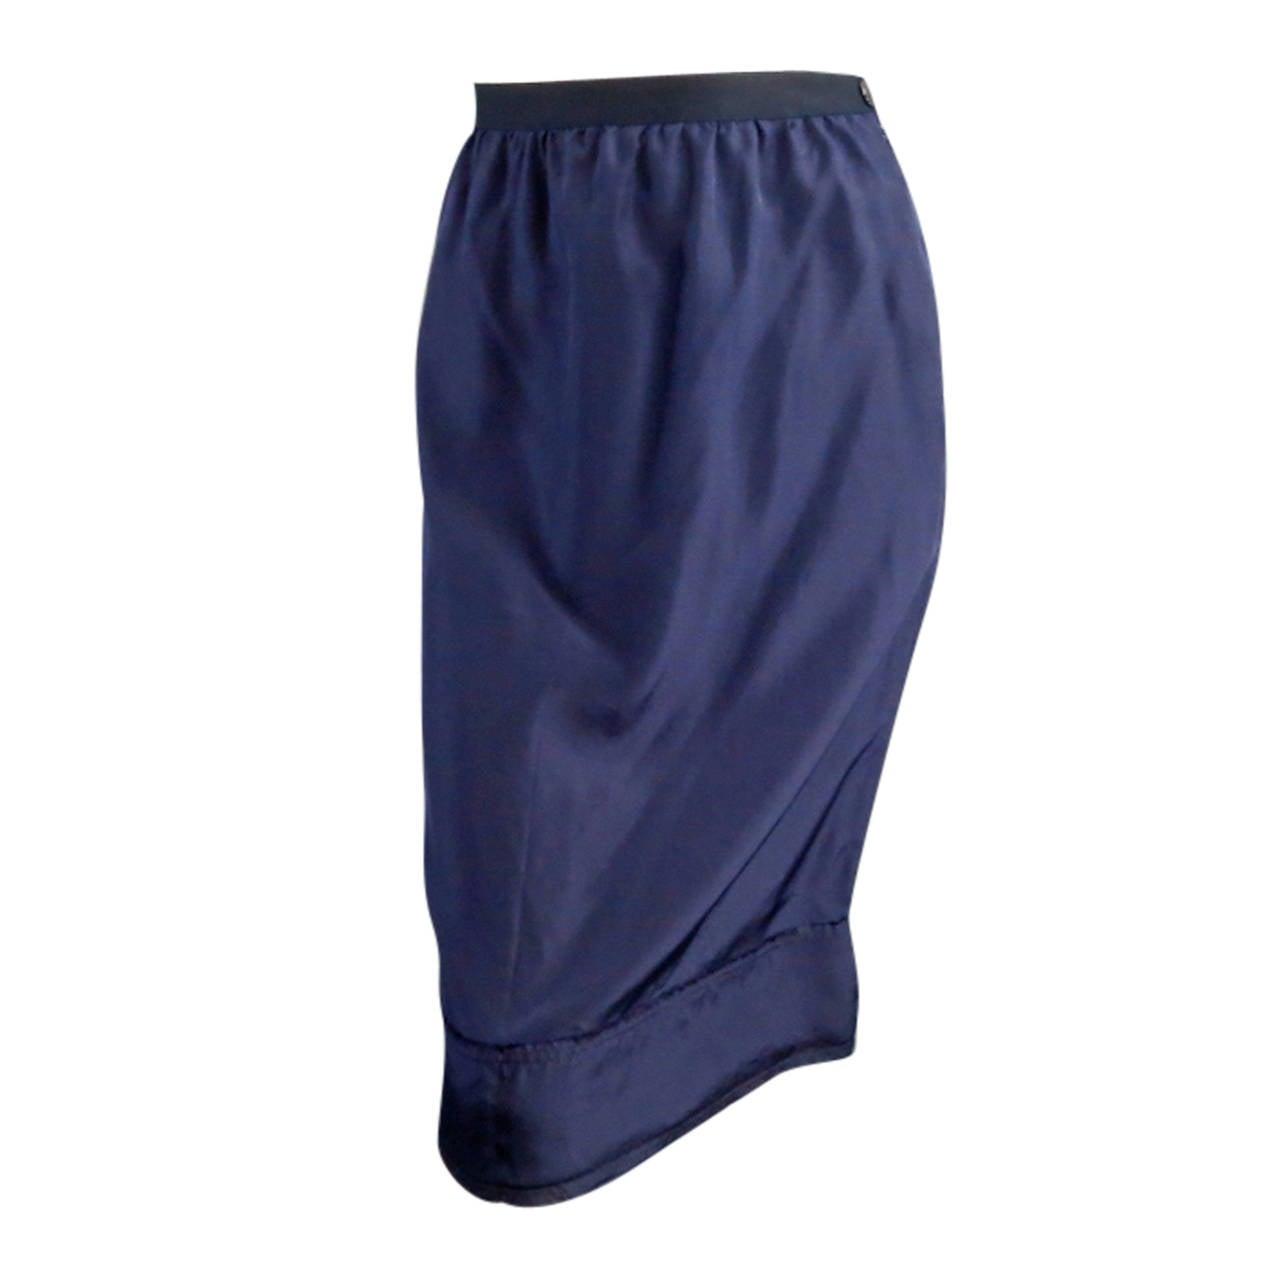 LANVIN Size 6 Navy Silk Ribon Waist Raw Hemmed Skirt 2008